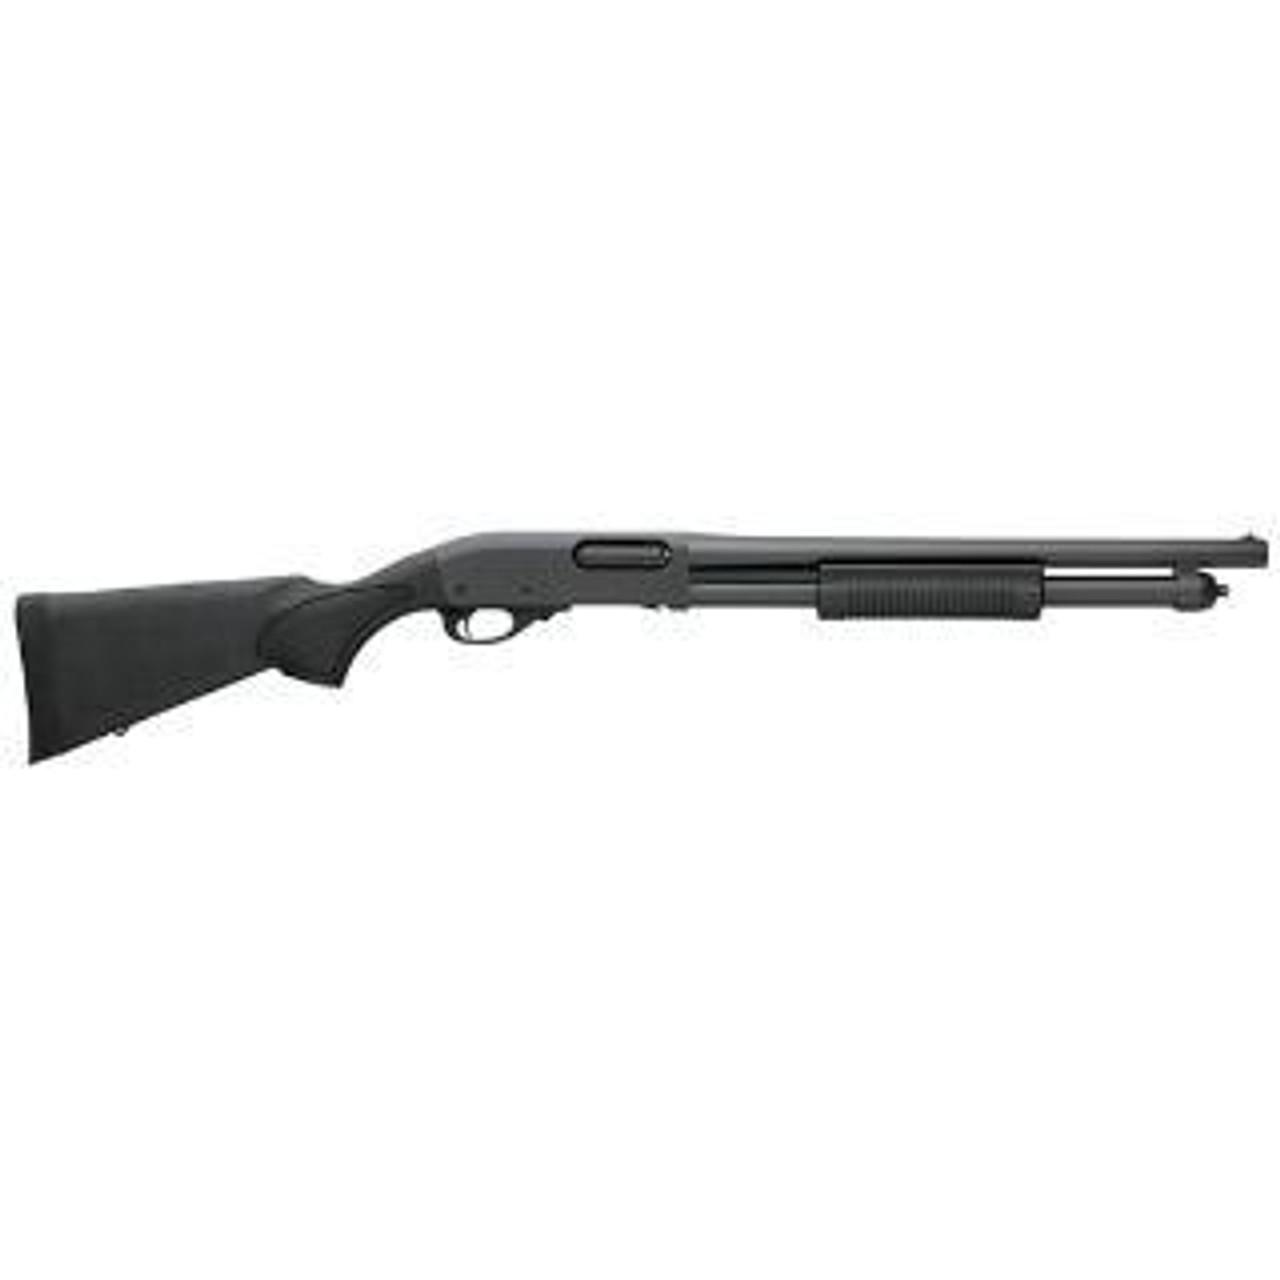 Remington 870 Express - California Legal